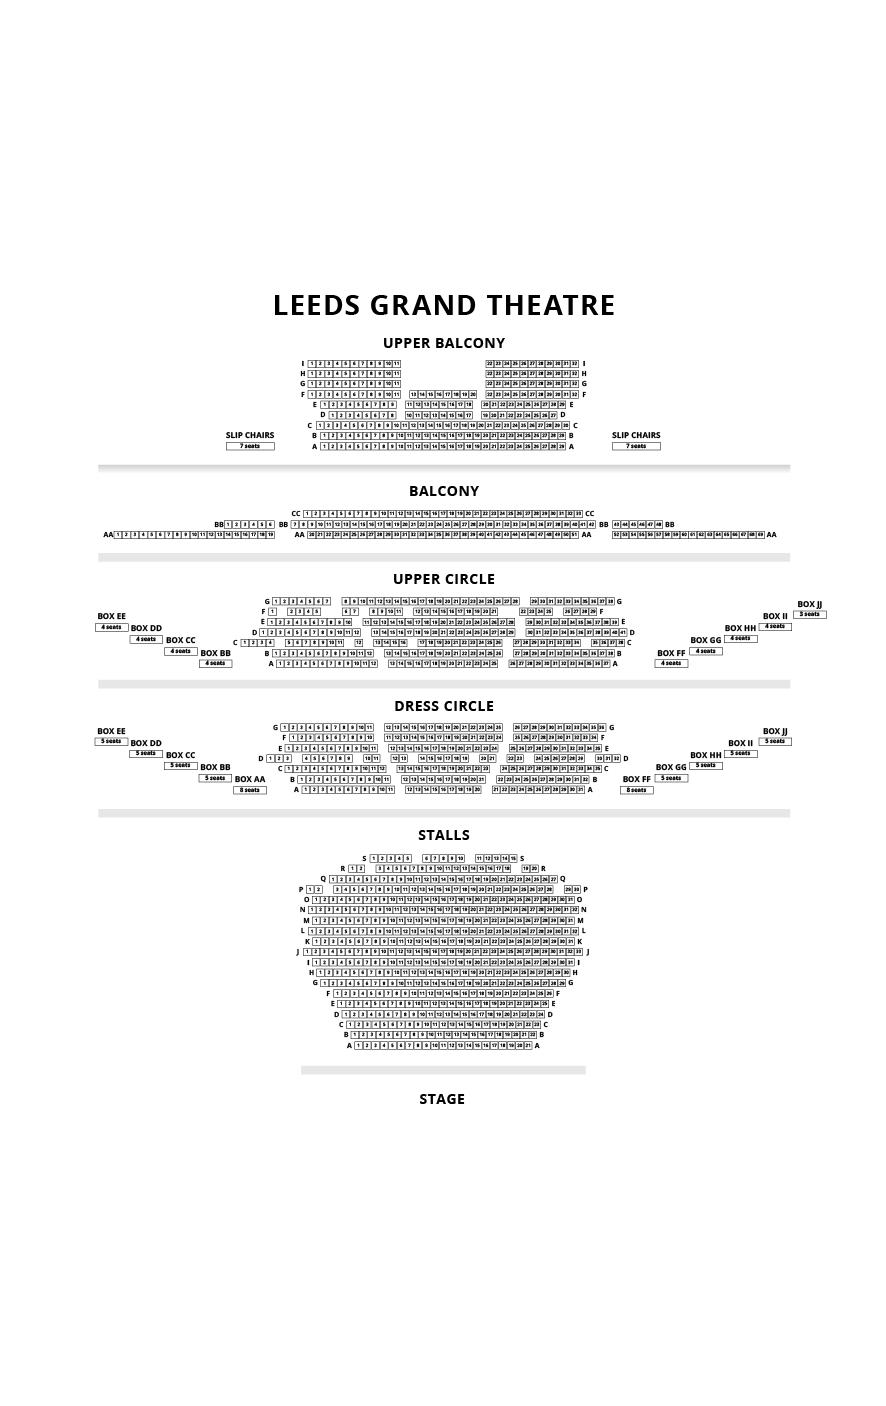 Leeds Grand Theatre Seating Plan